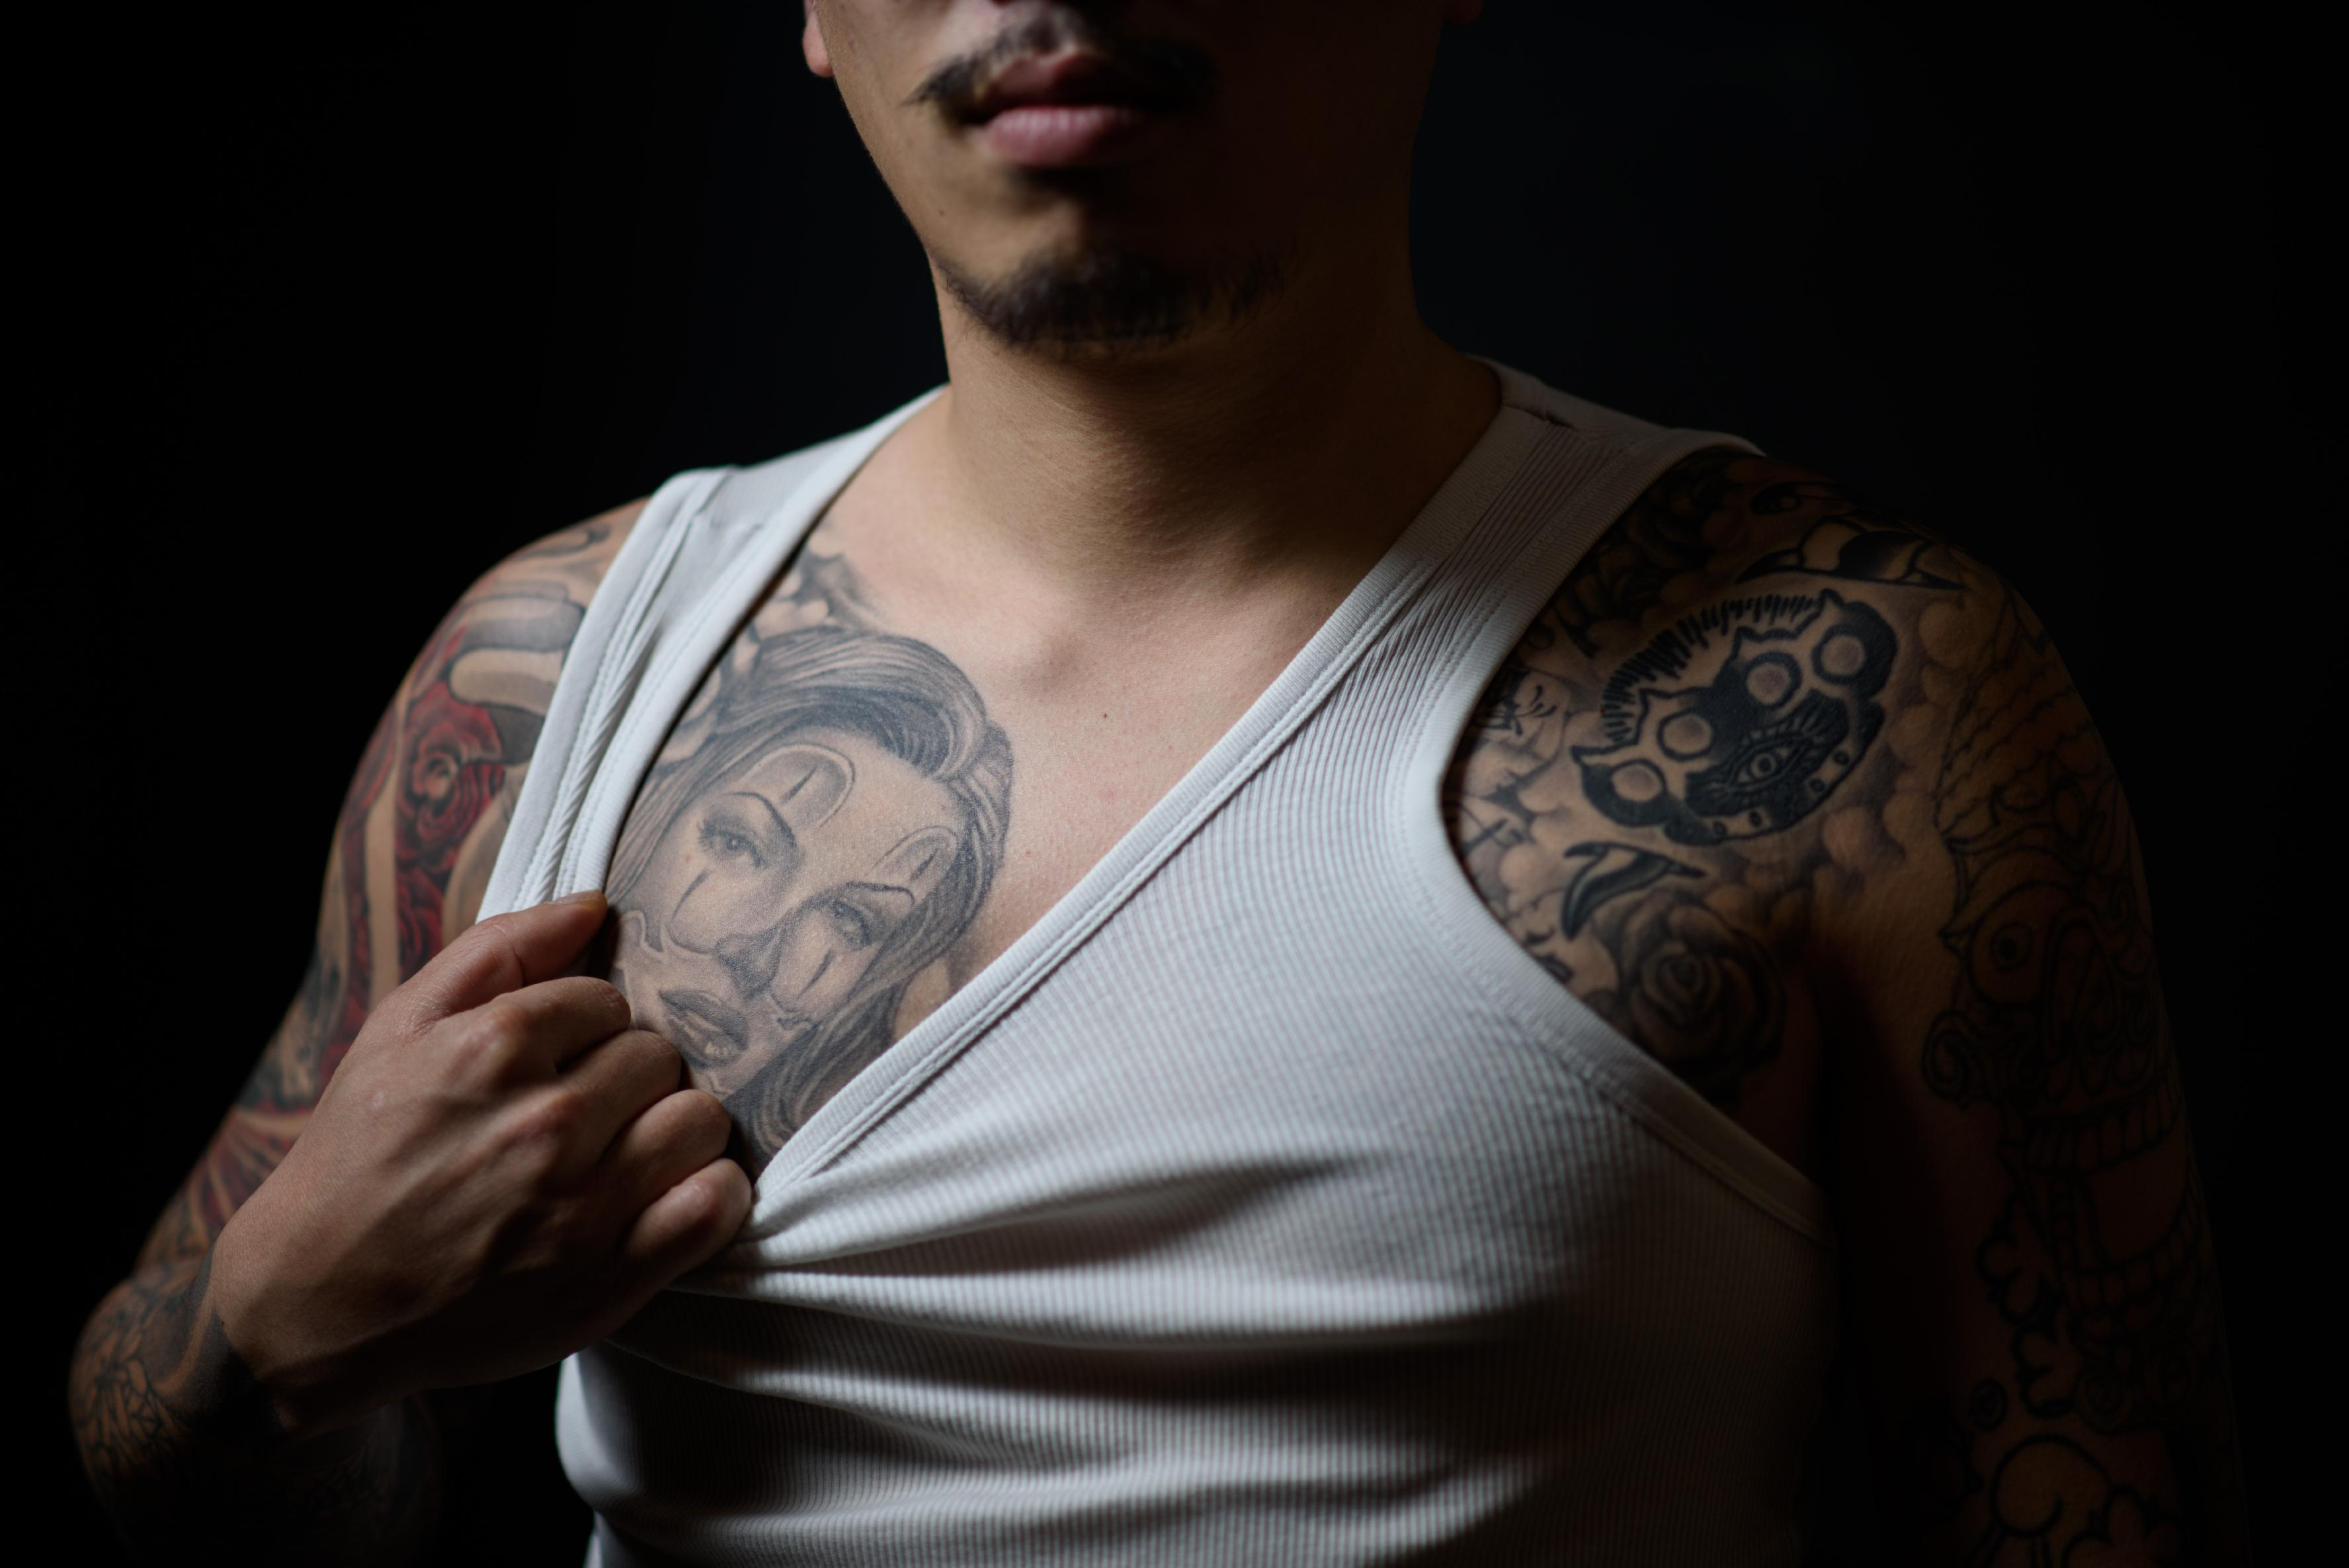 92be8c23f Tattoo artist Horisen, 28, shows off his tattoos at the Tattooism studio in  Seoul